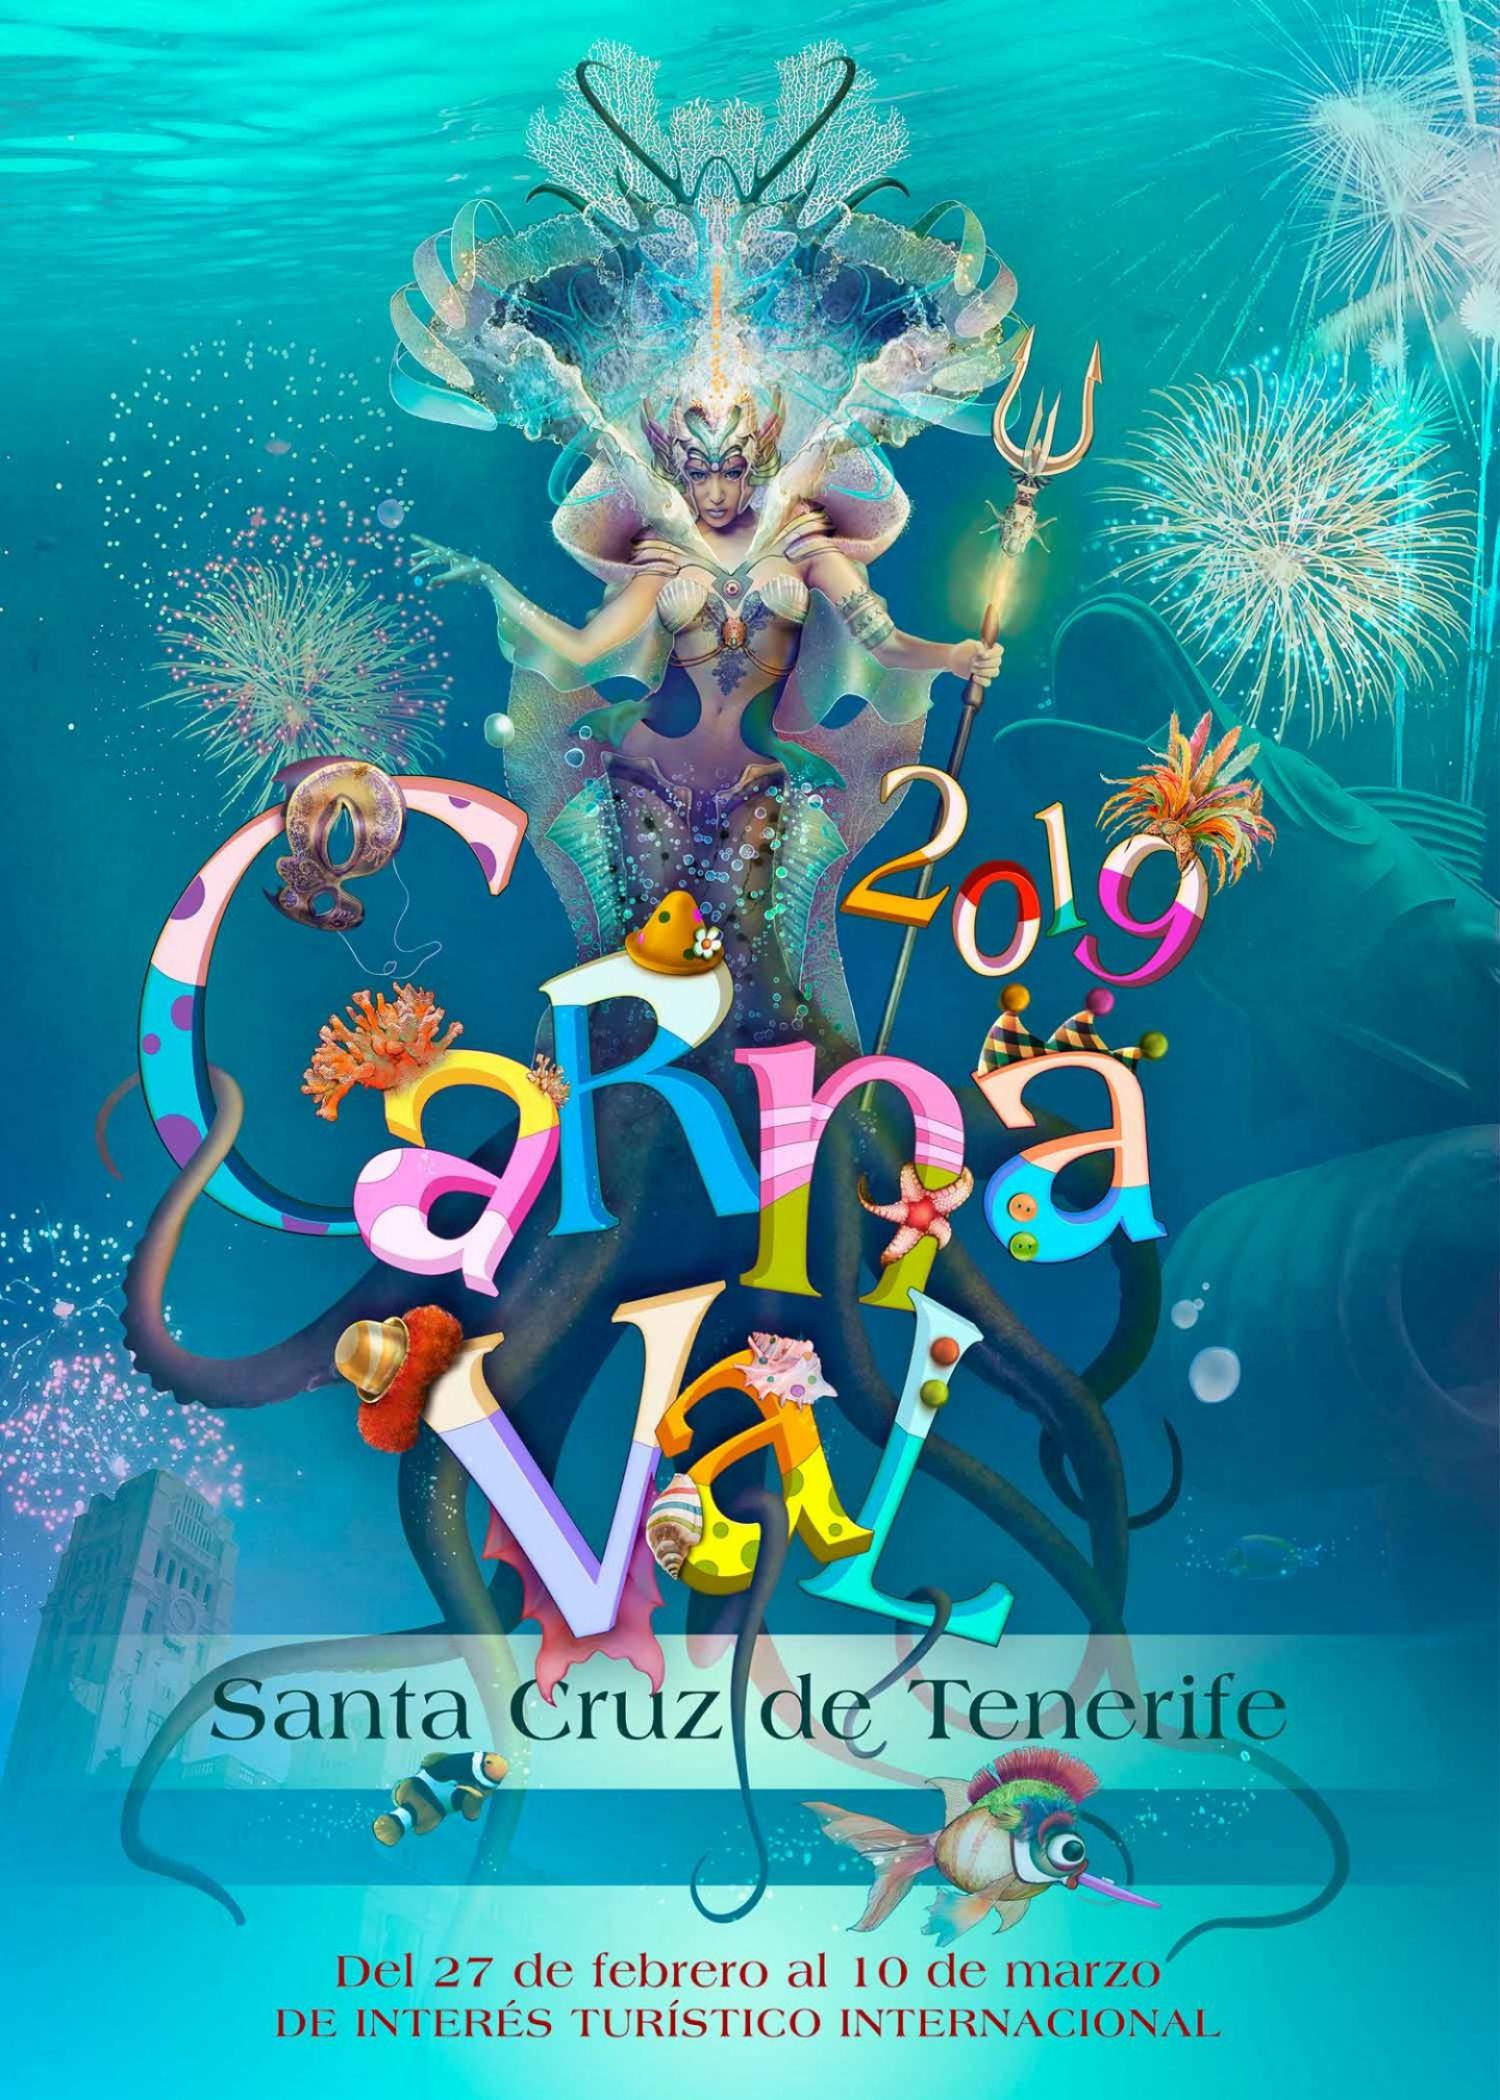 Carnival Queen Gala 2019